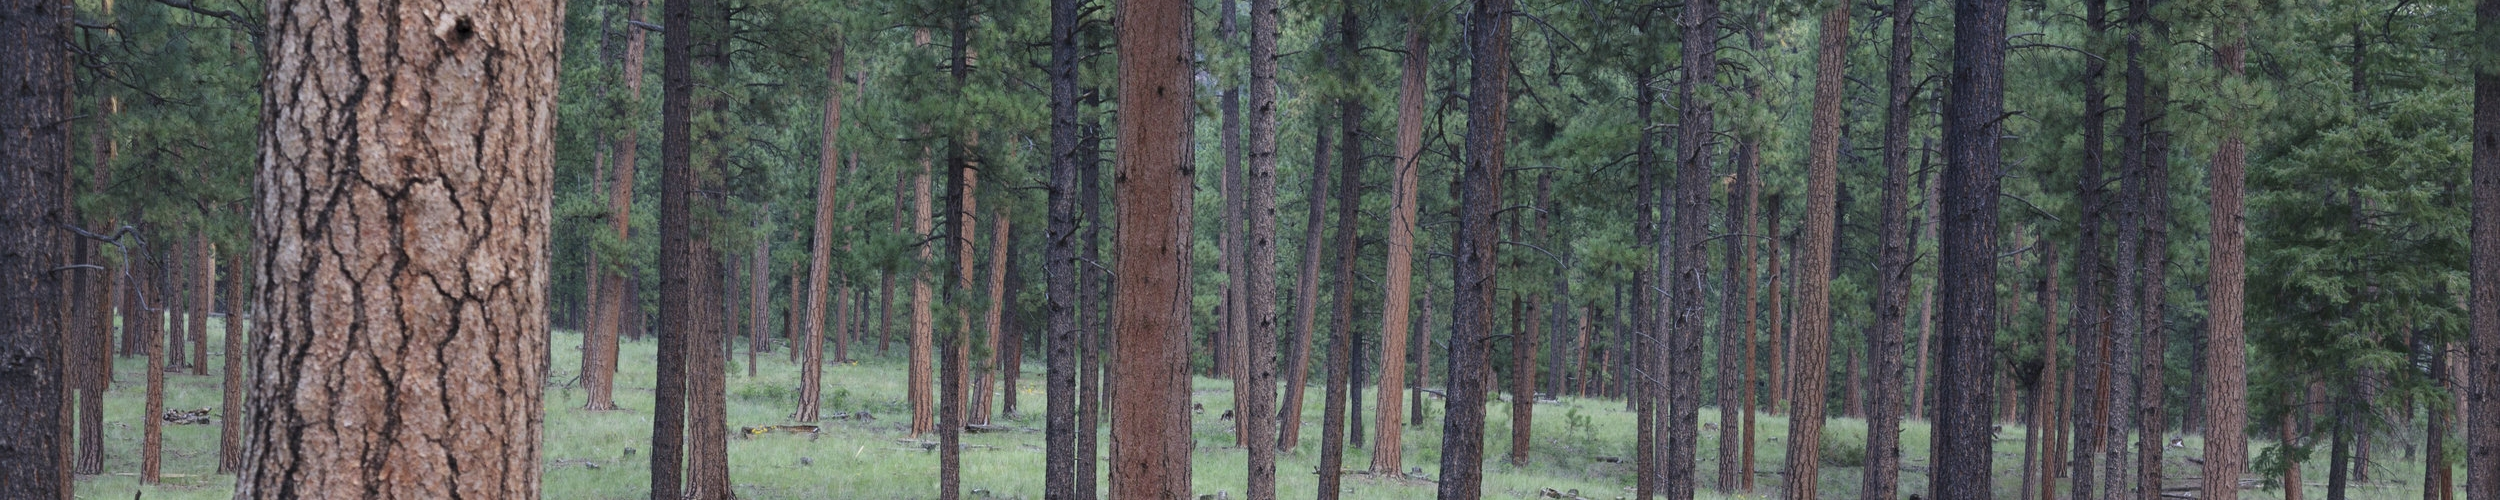 Healthy ponderosa pine forest_Jemez (c) Alan Eckert Photography.jpg